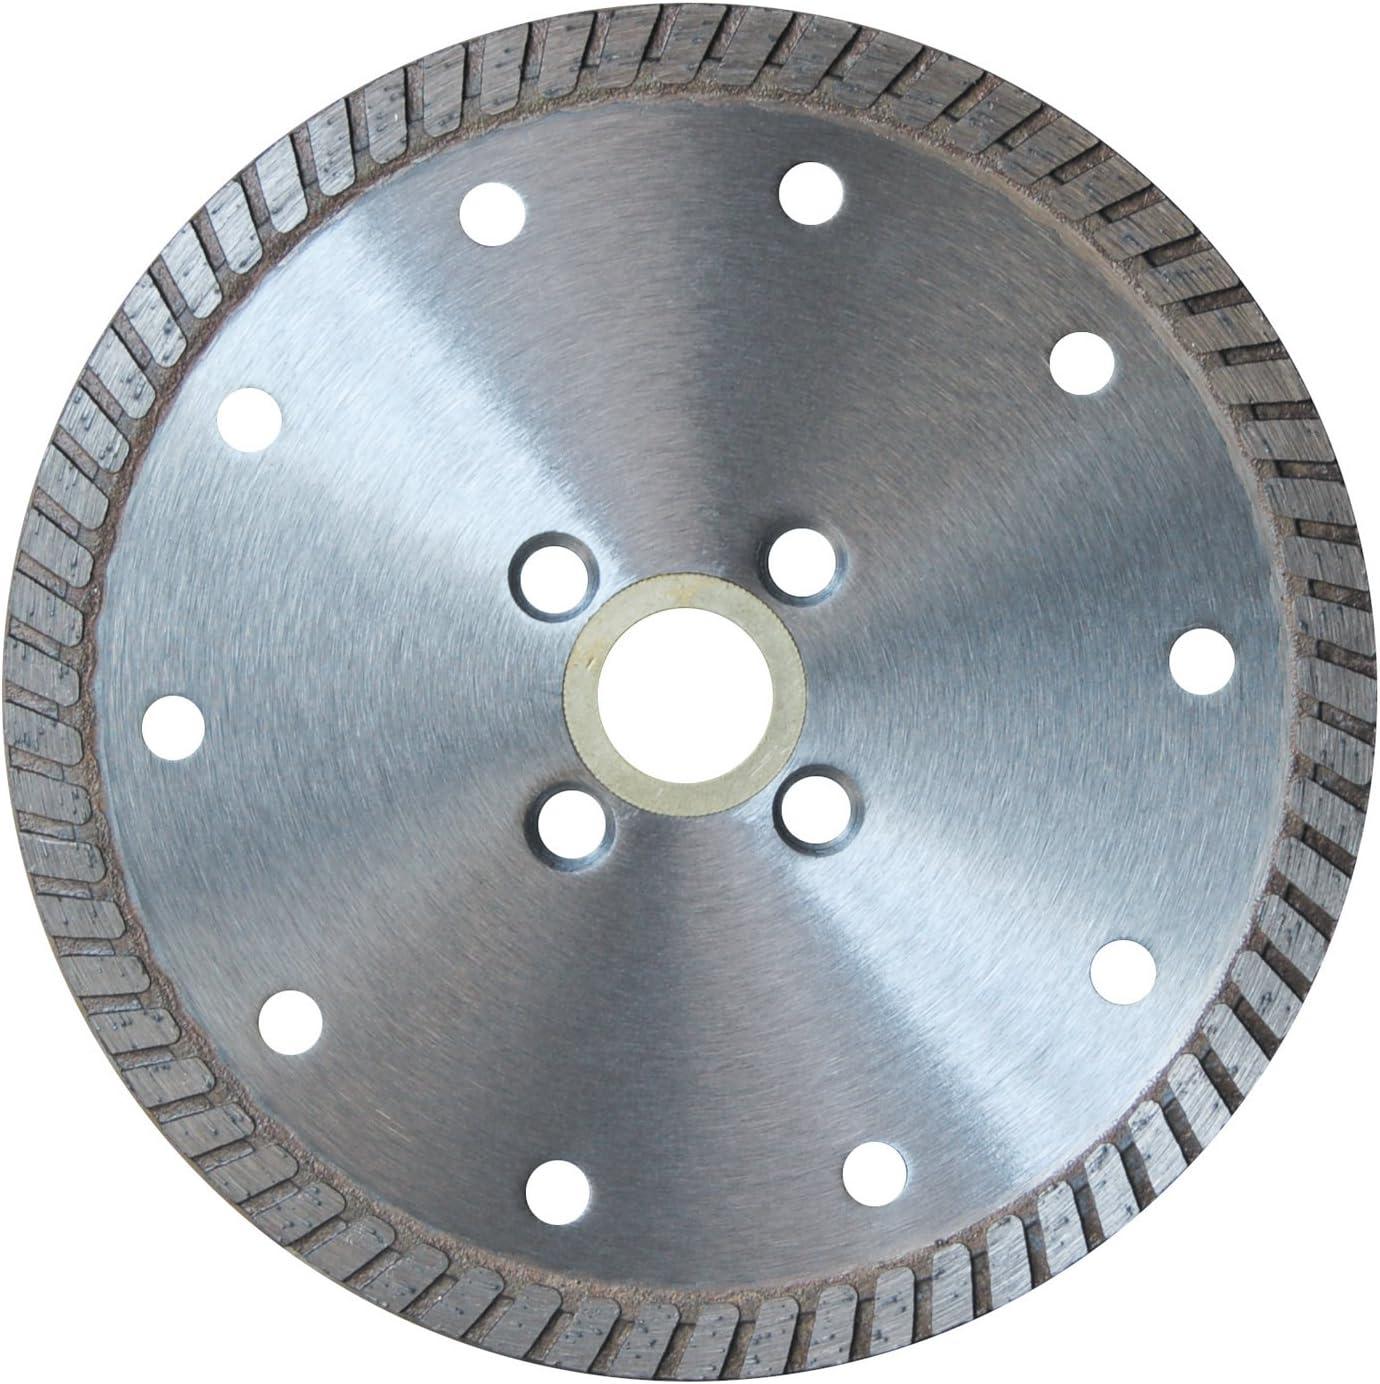 Protech Btr050hp Turbo Stone Premium Grade Blade Amazon Com